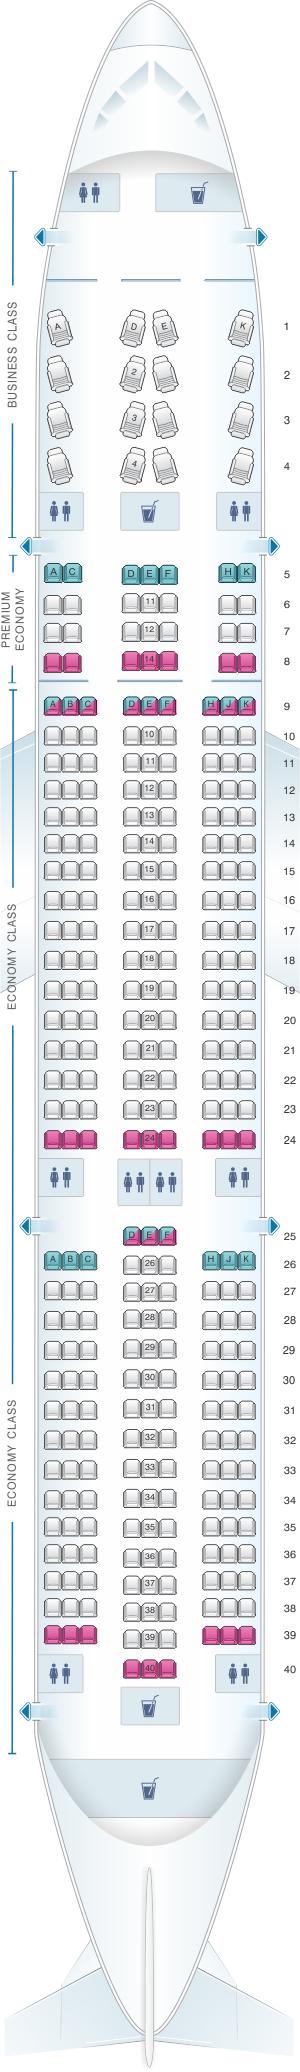 Seat map for WestJet Boeing B787 9